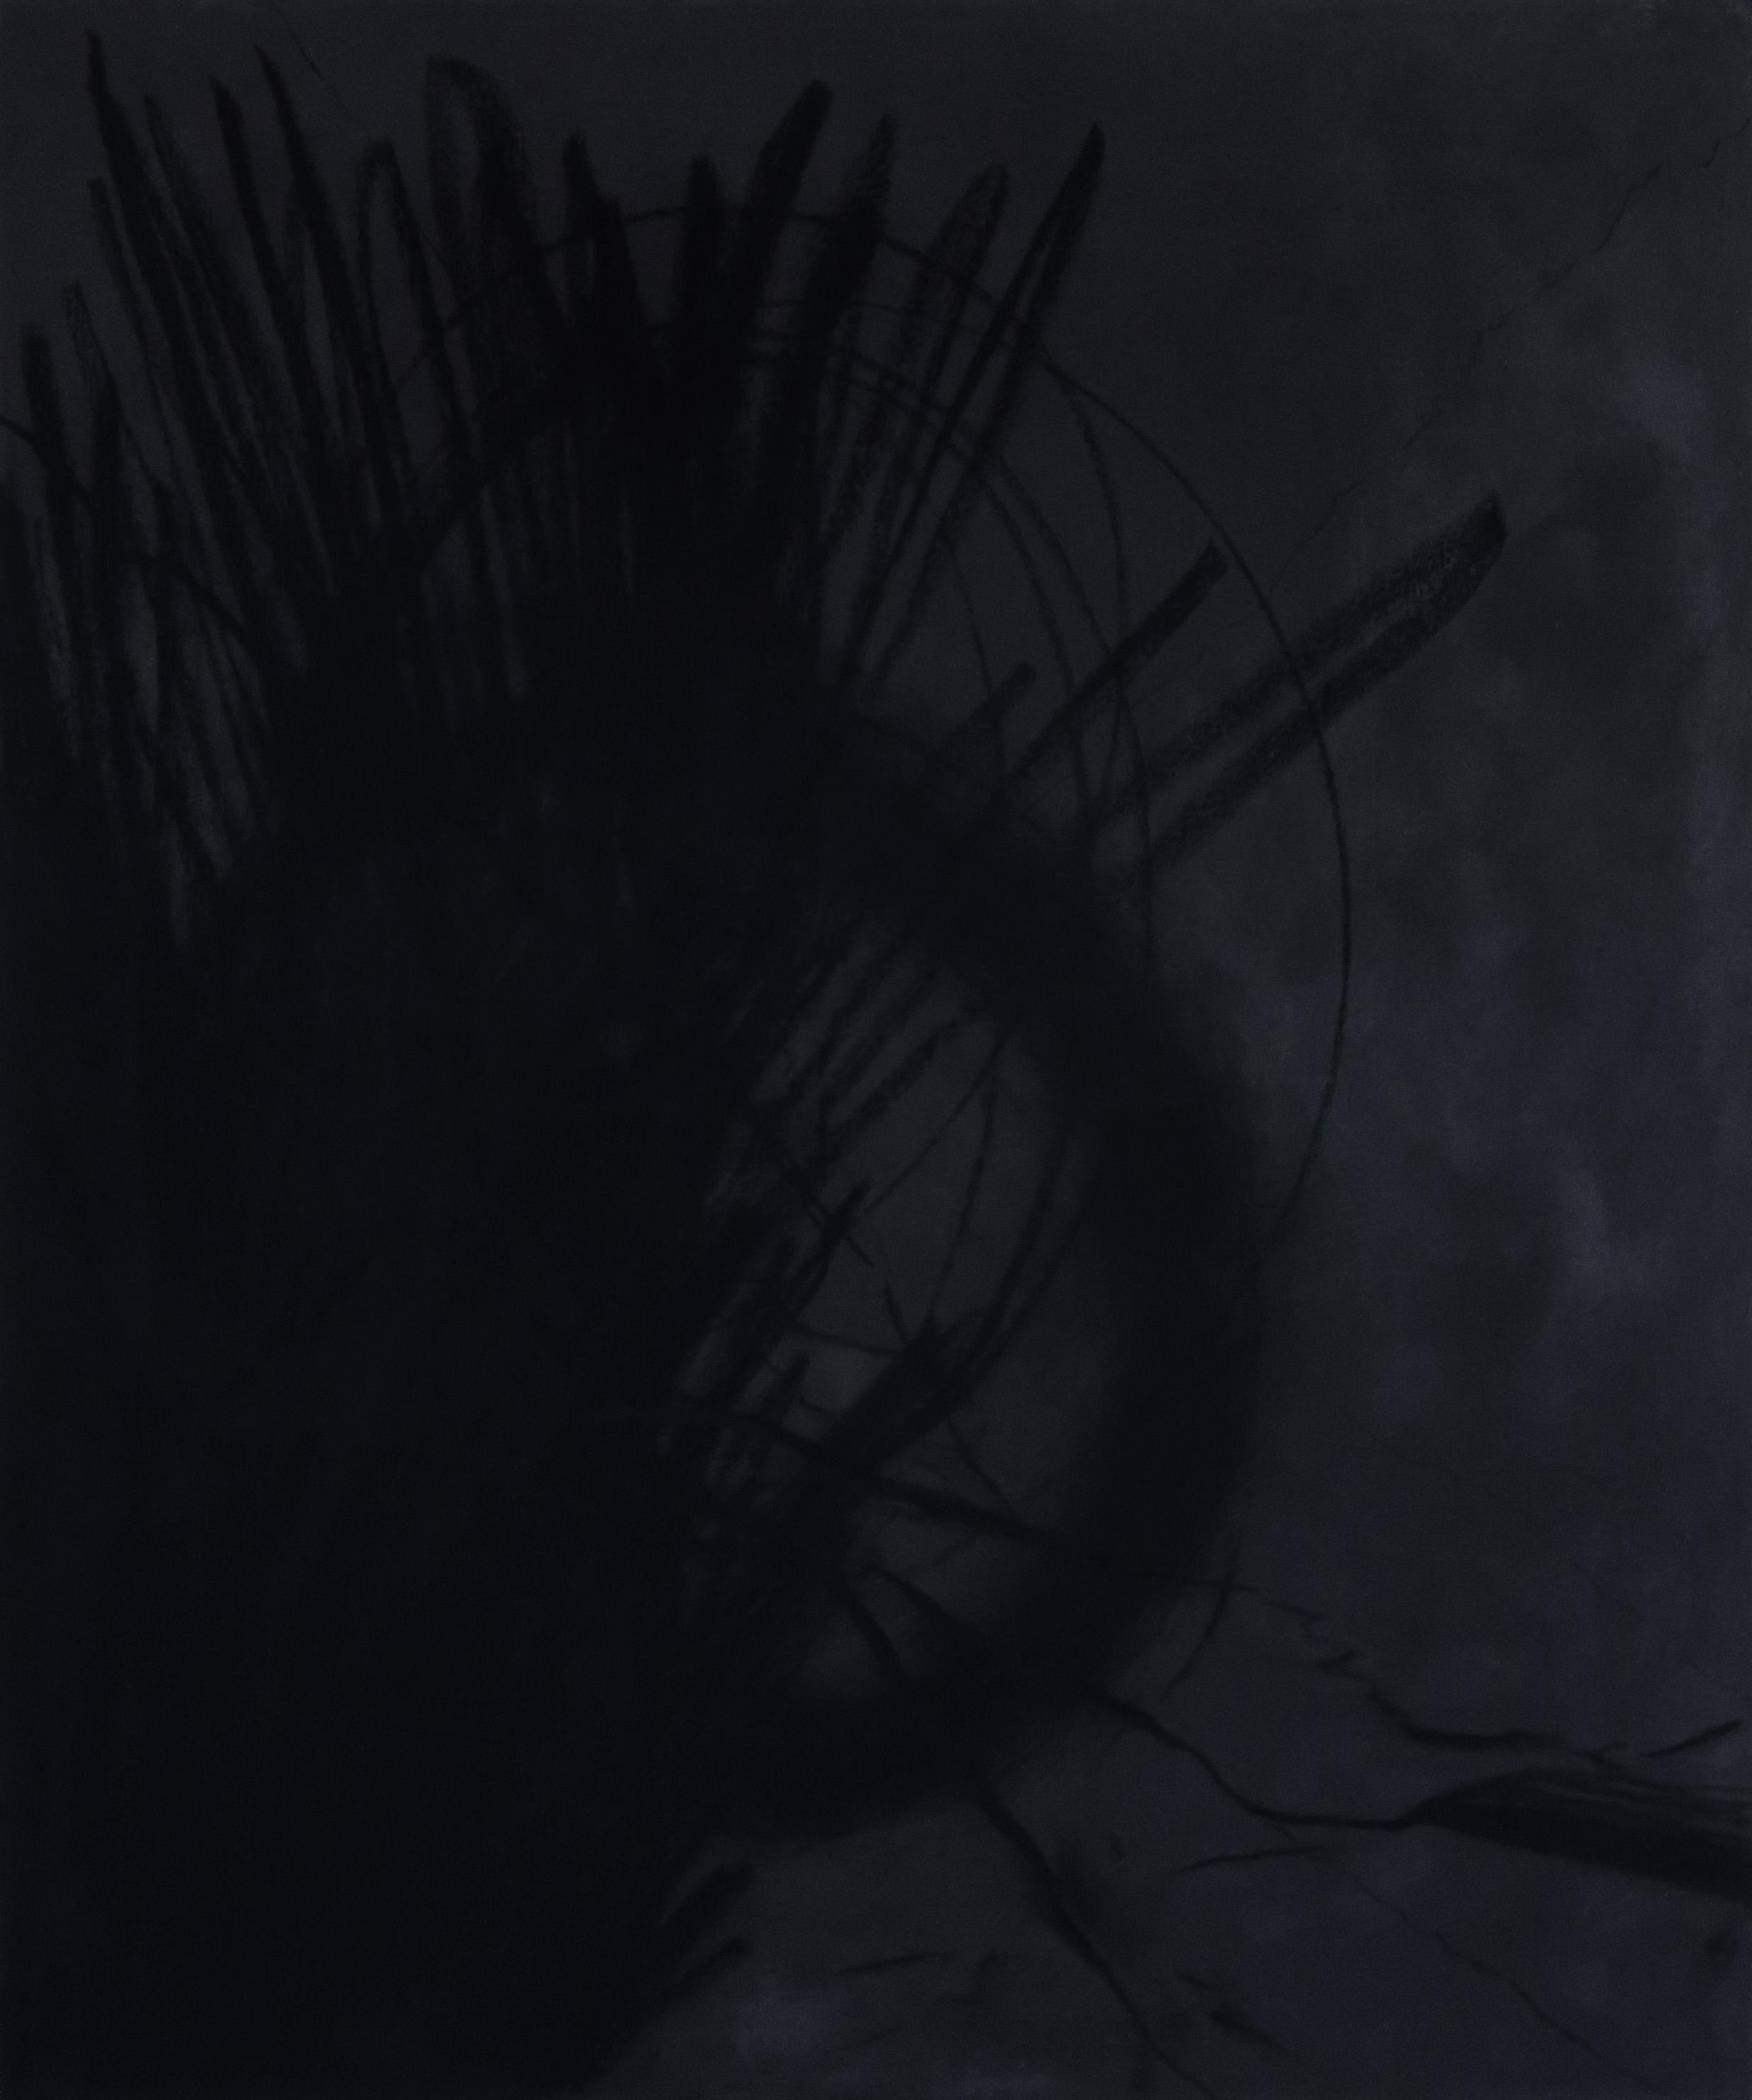 "HONEST PAINTING 04 / Mixed media on canvas / 30""x36"" / Ashley Opperman / 2019"